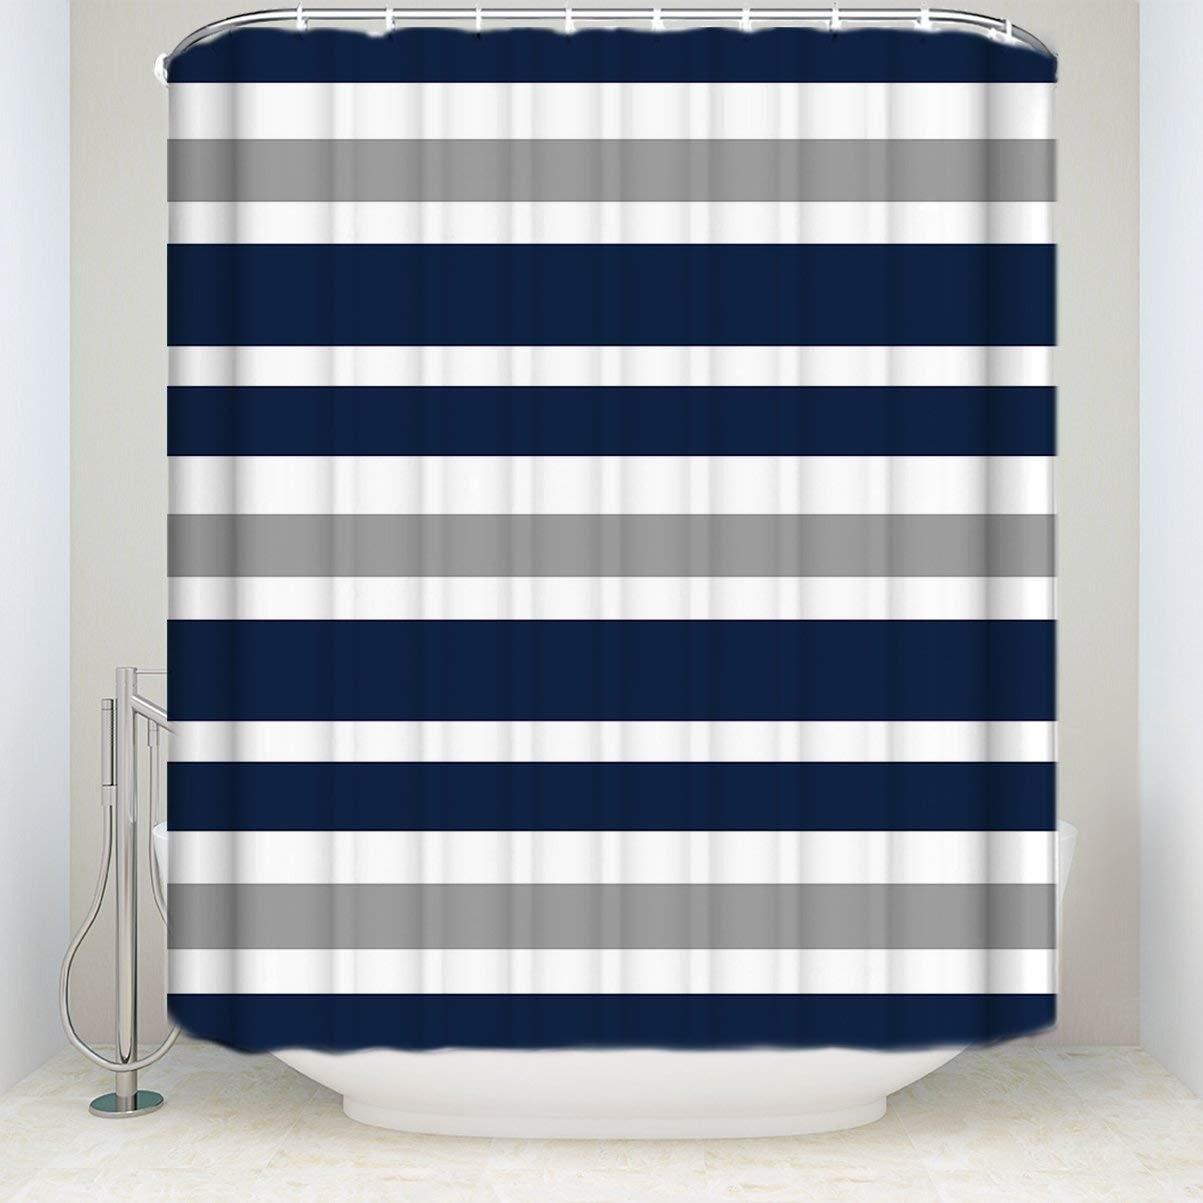 Designs Navy Blue Gray And White Kids Bathroom Fabric Bath Teen Stripe Shower Curtain Shower Curtains Aliexpress